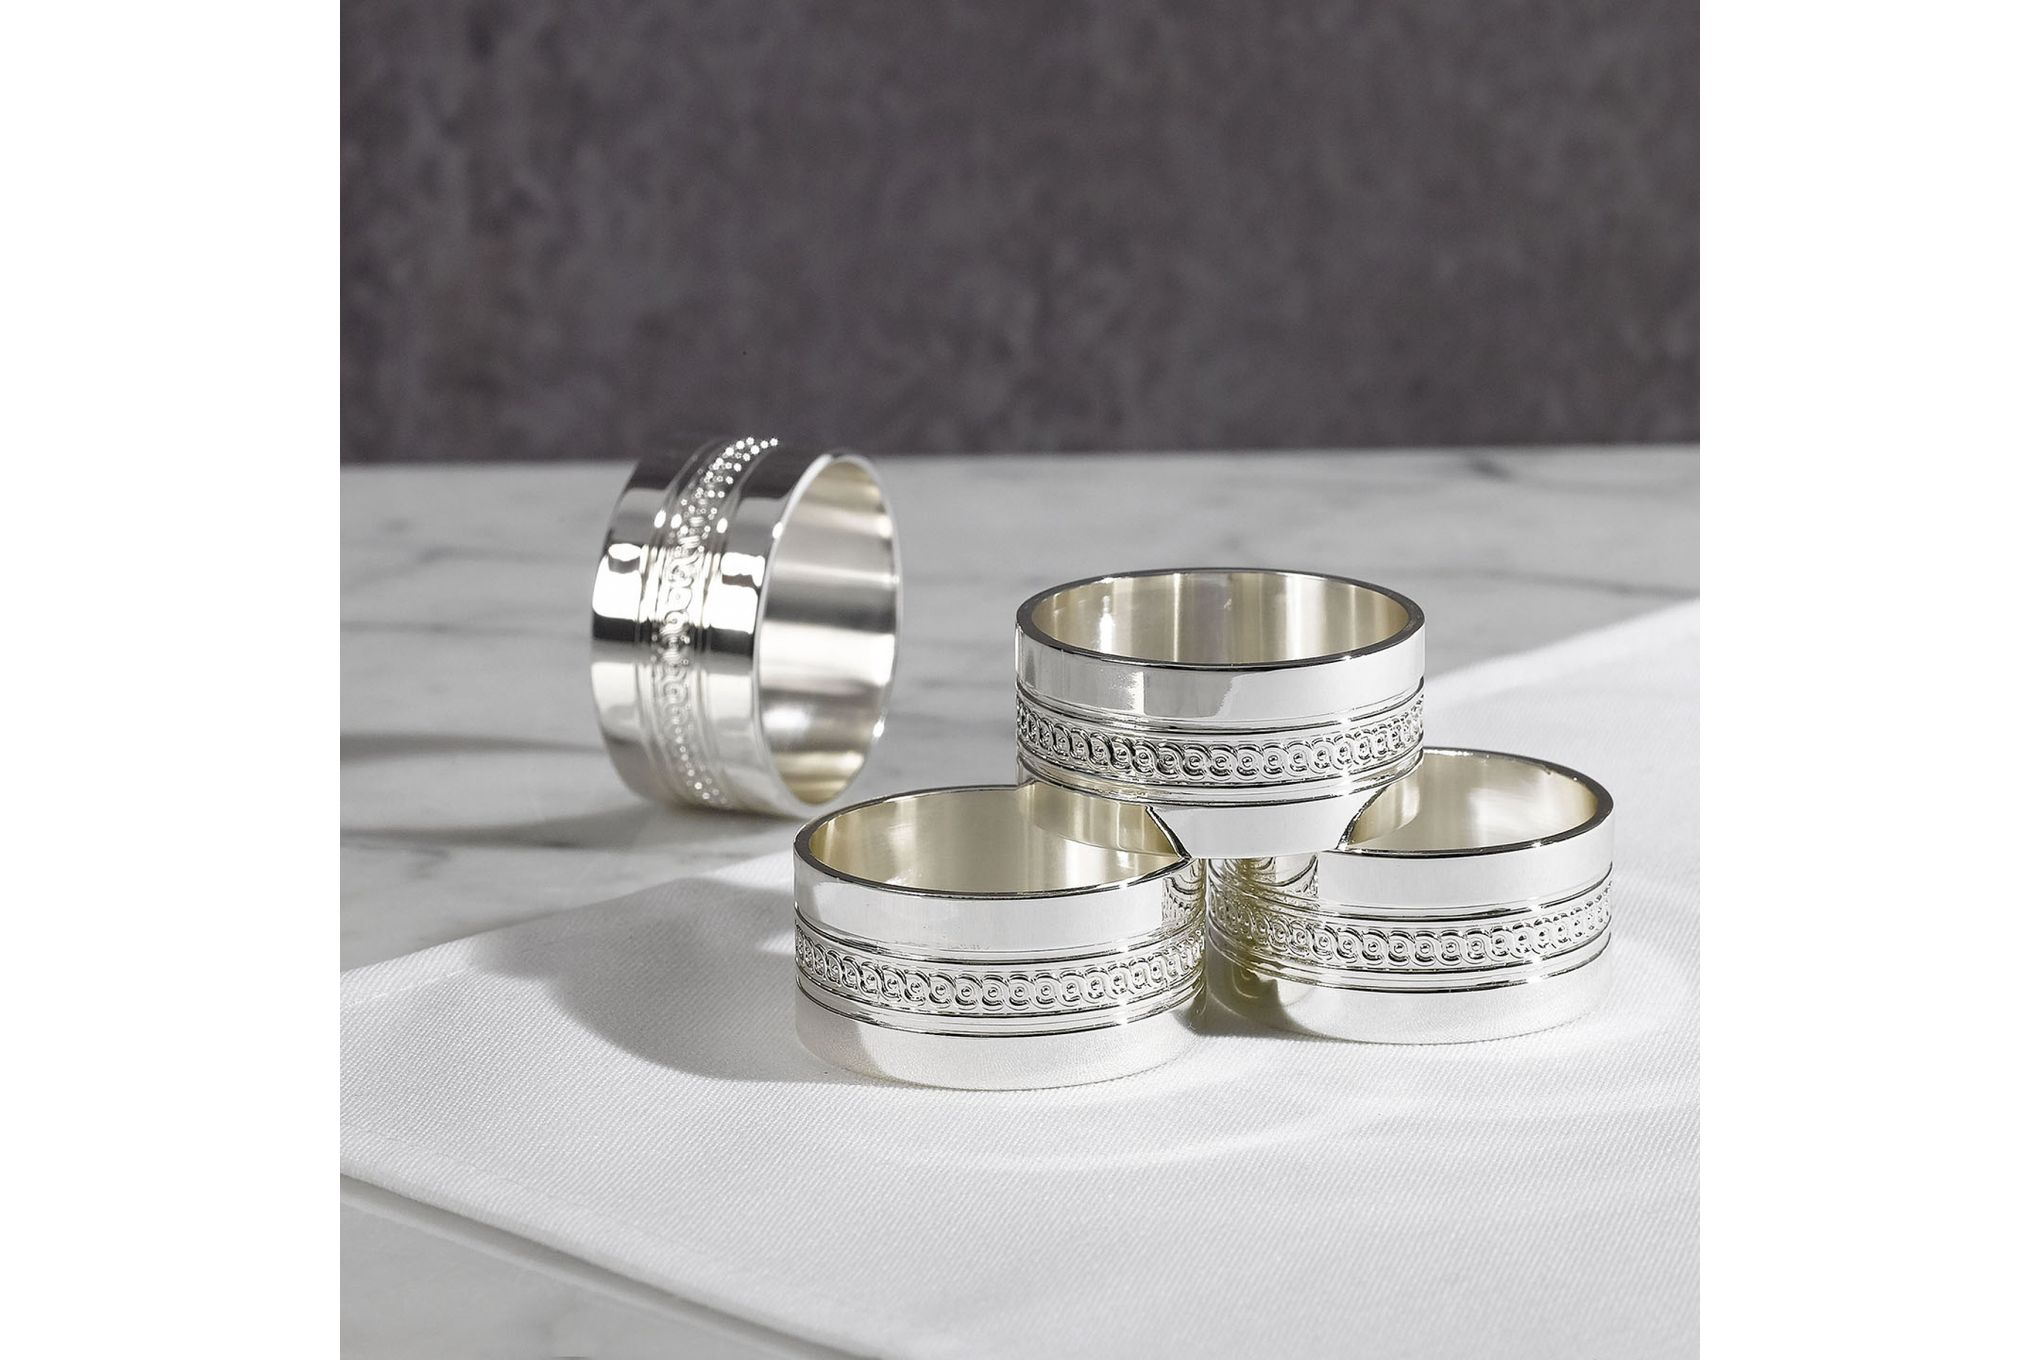 Wedgwood Simply Wish Napkin Rings Set of 4 thumb 2